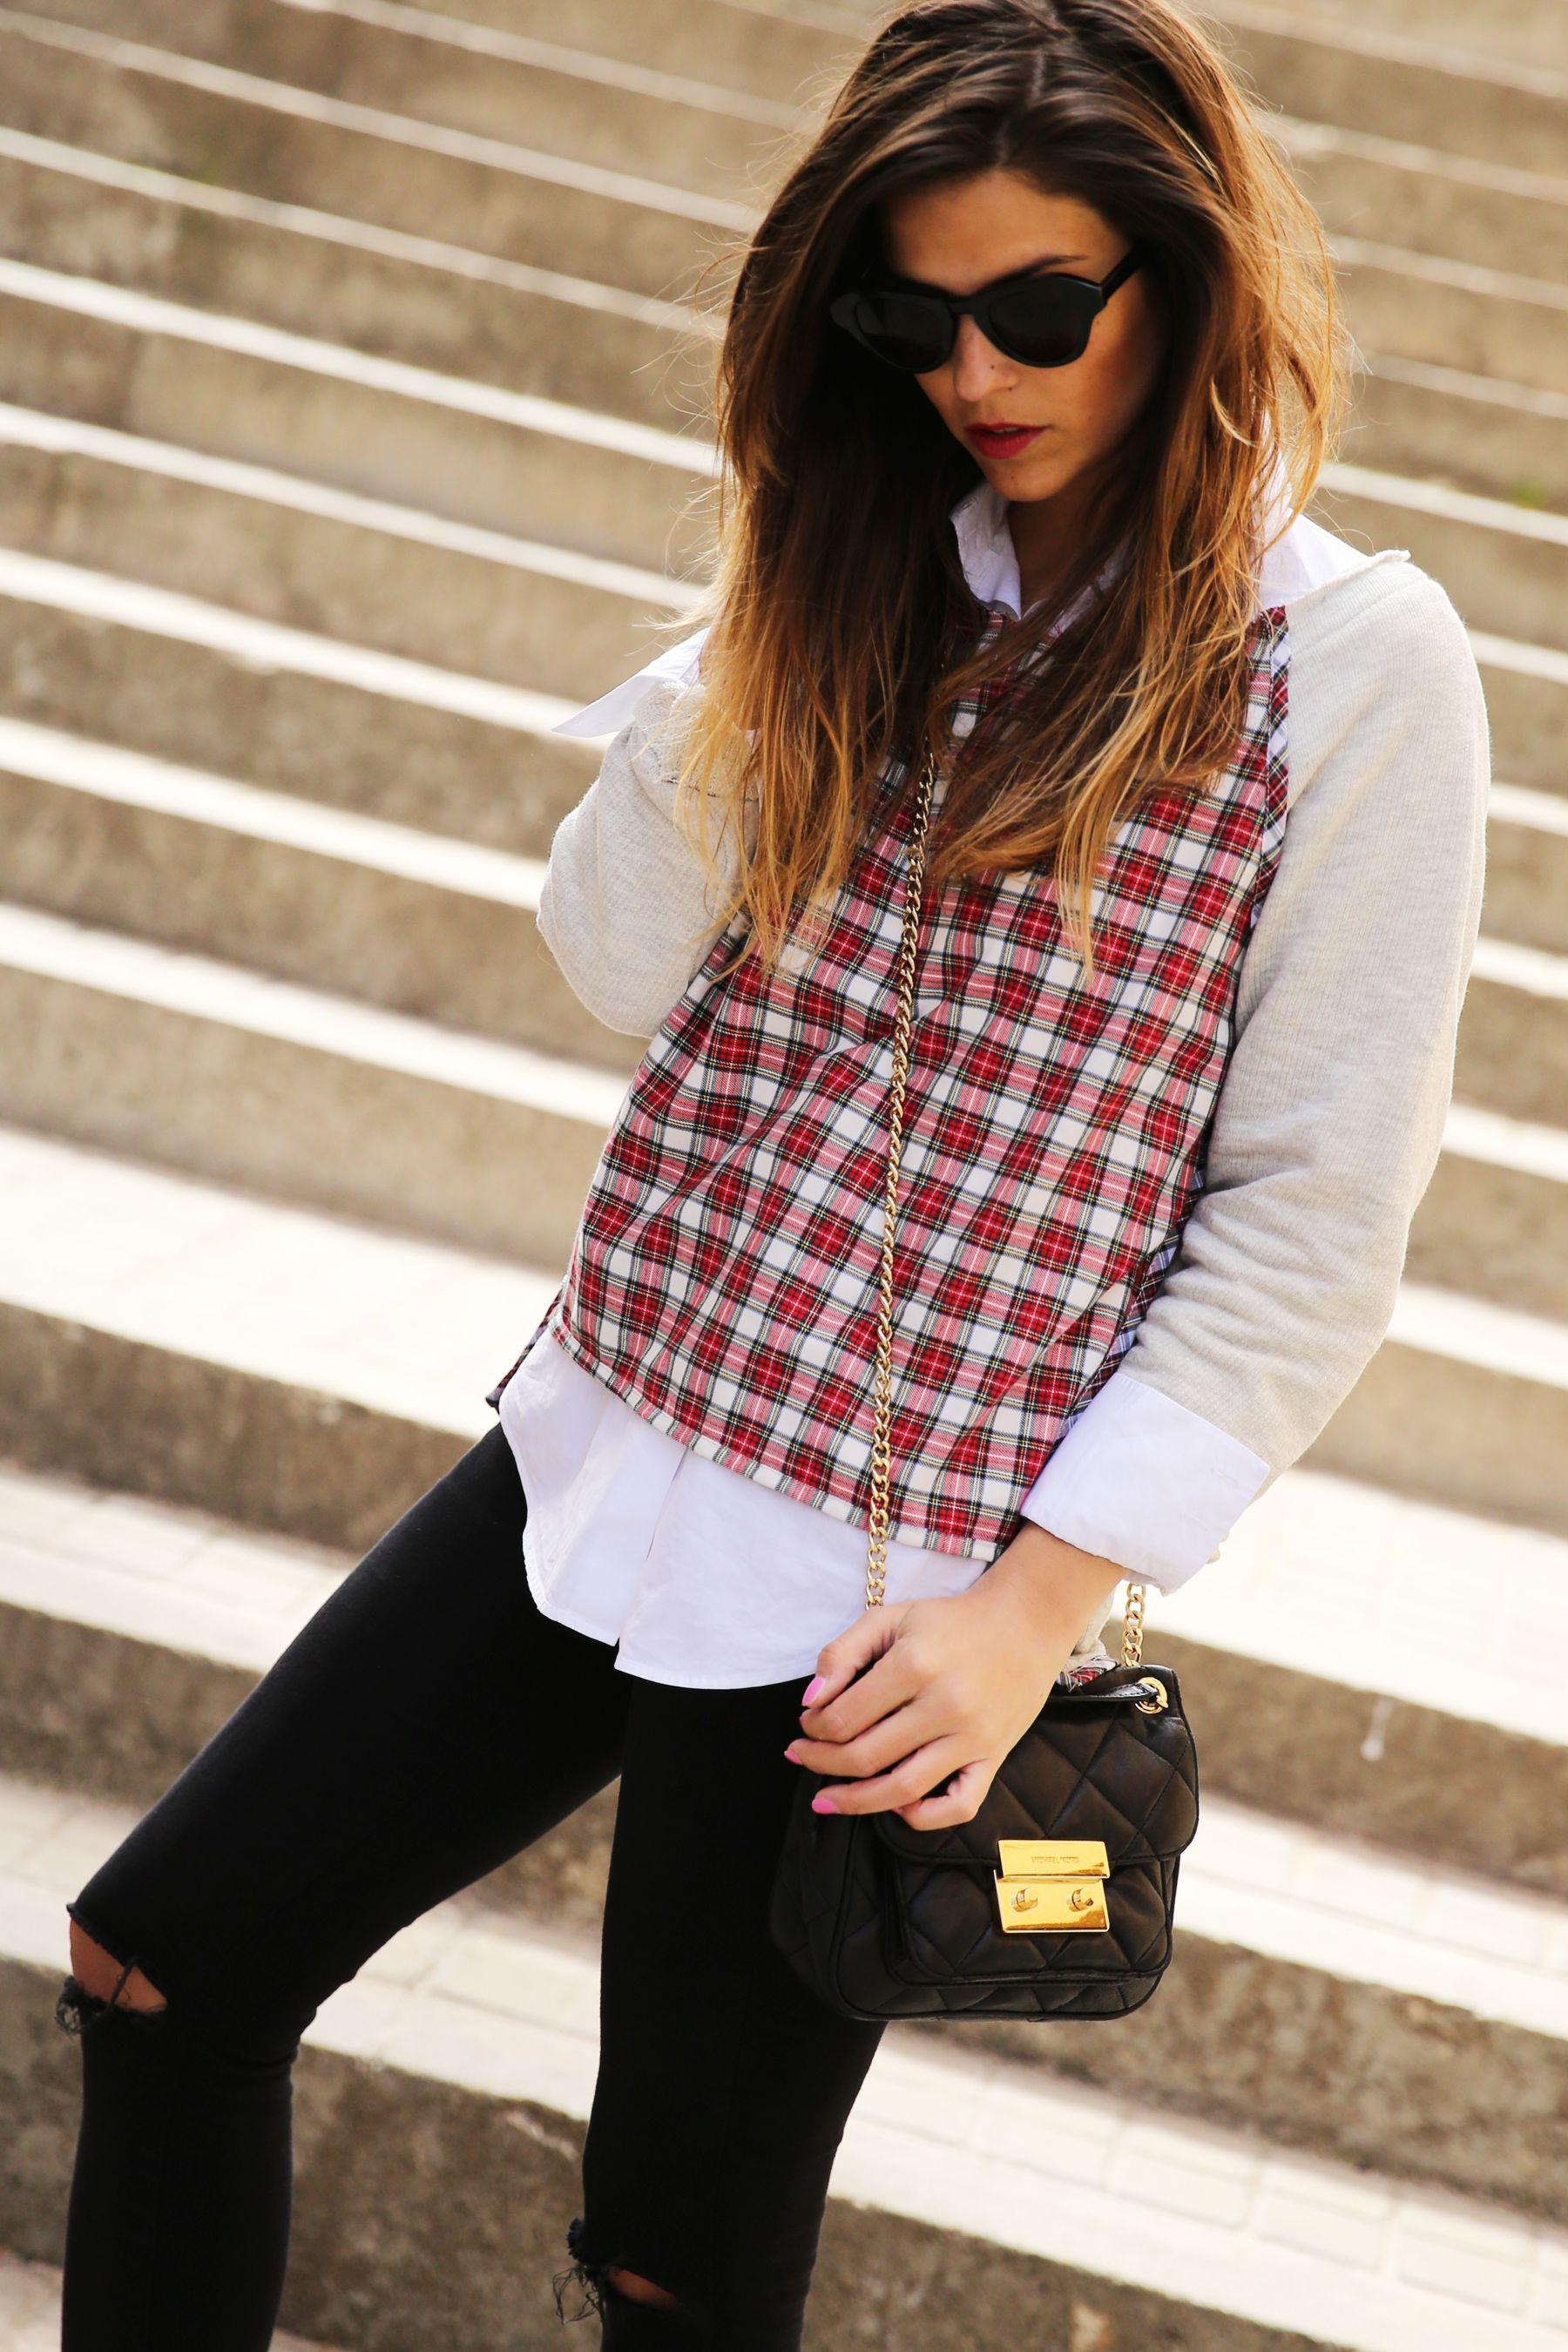 trendy_taste-look-outfit-street_style-ootd-blog-blogger-fashion-spain-moda-españa-steve-madden-plaid-shirt-camisa-cuadros-skinny-jeans-pitillos-negros-6